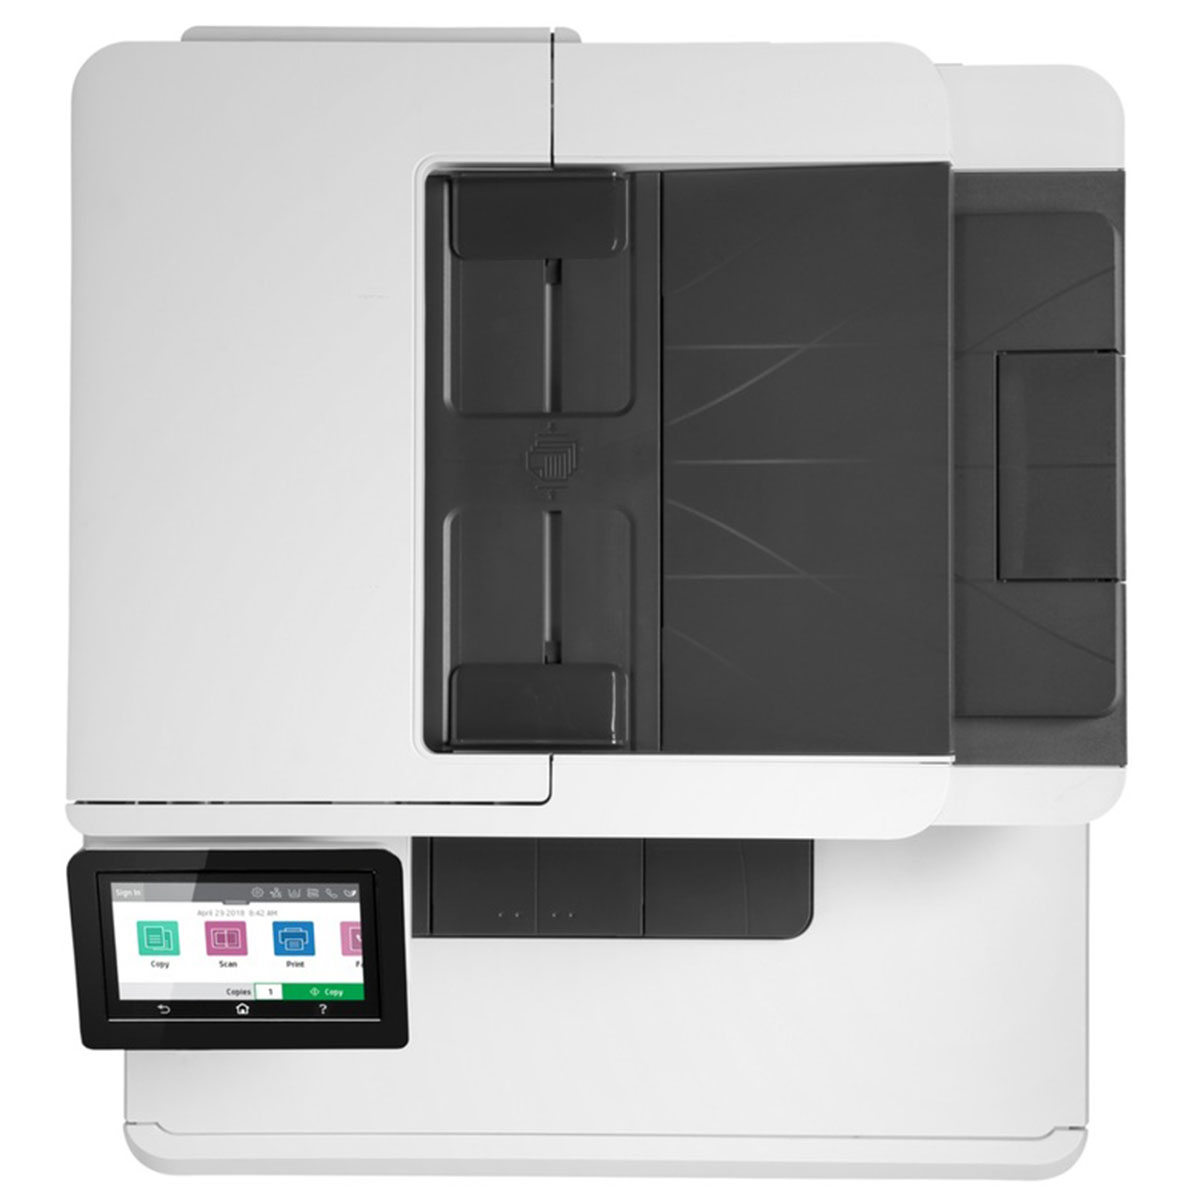 HP Color LaserJet Pro M479fdn מדפסת לייזר